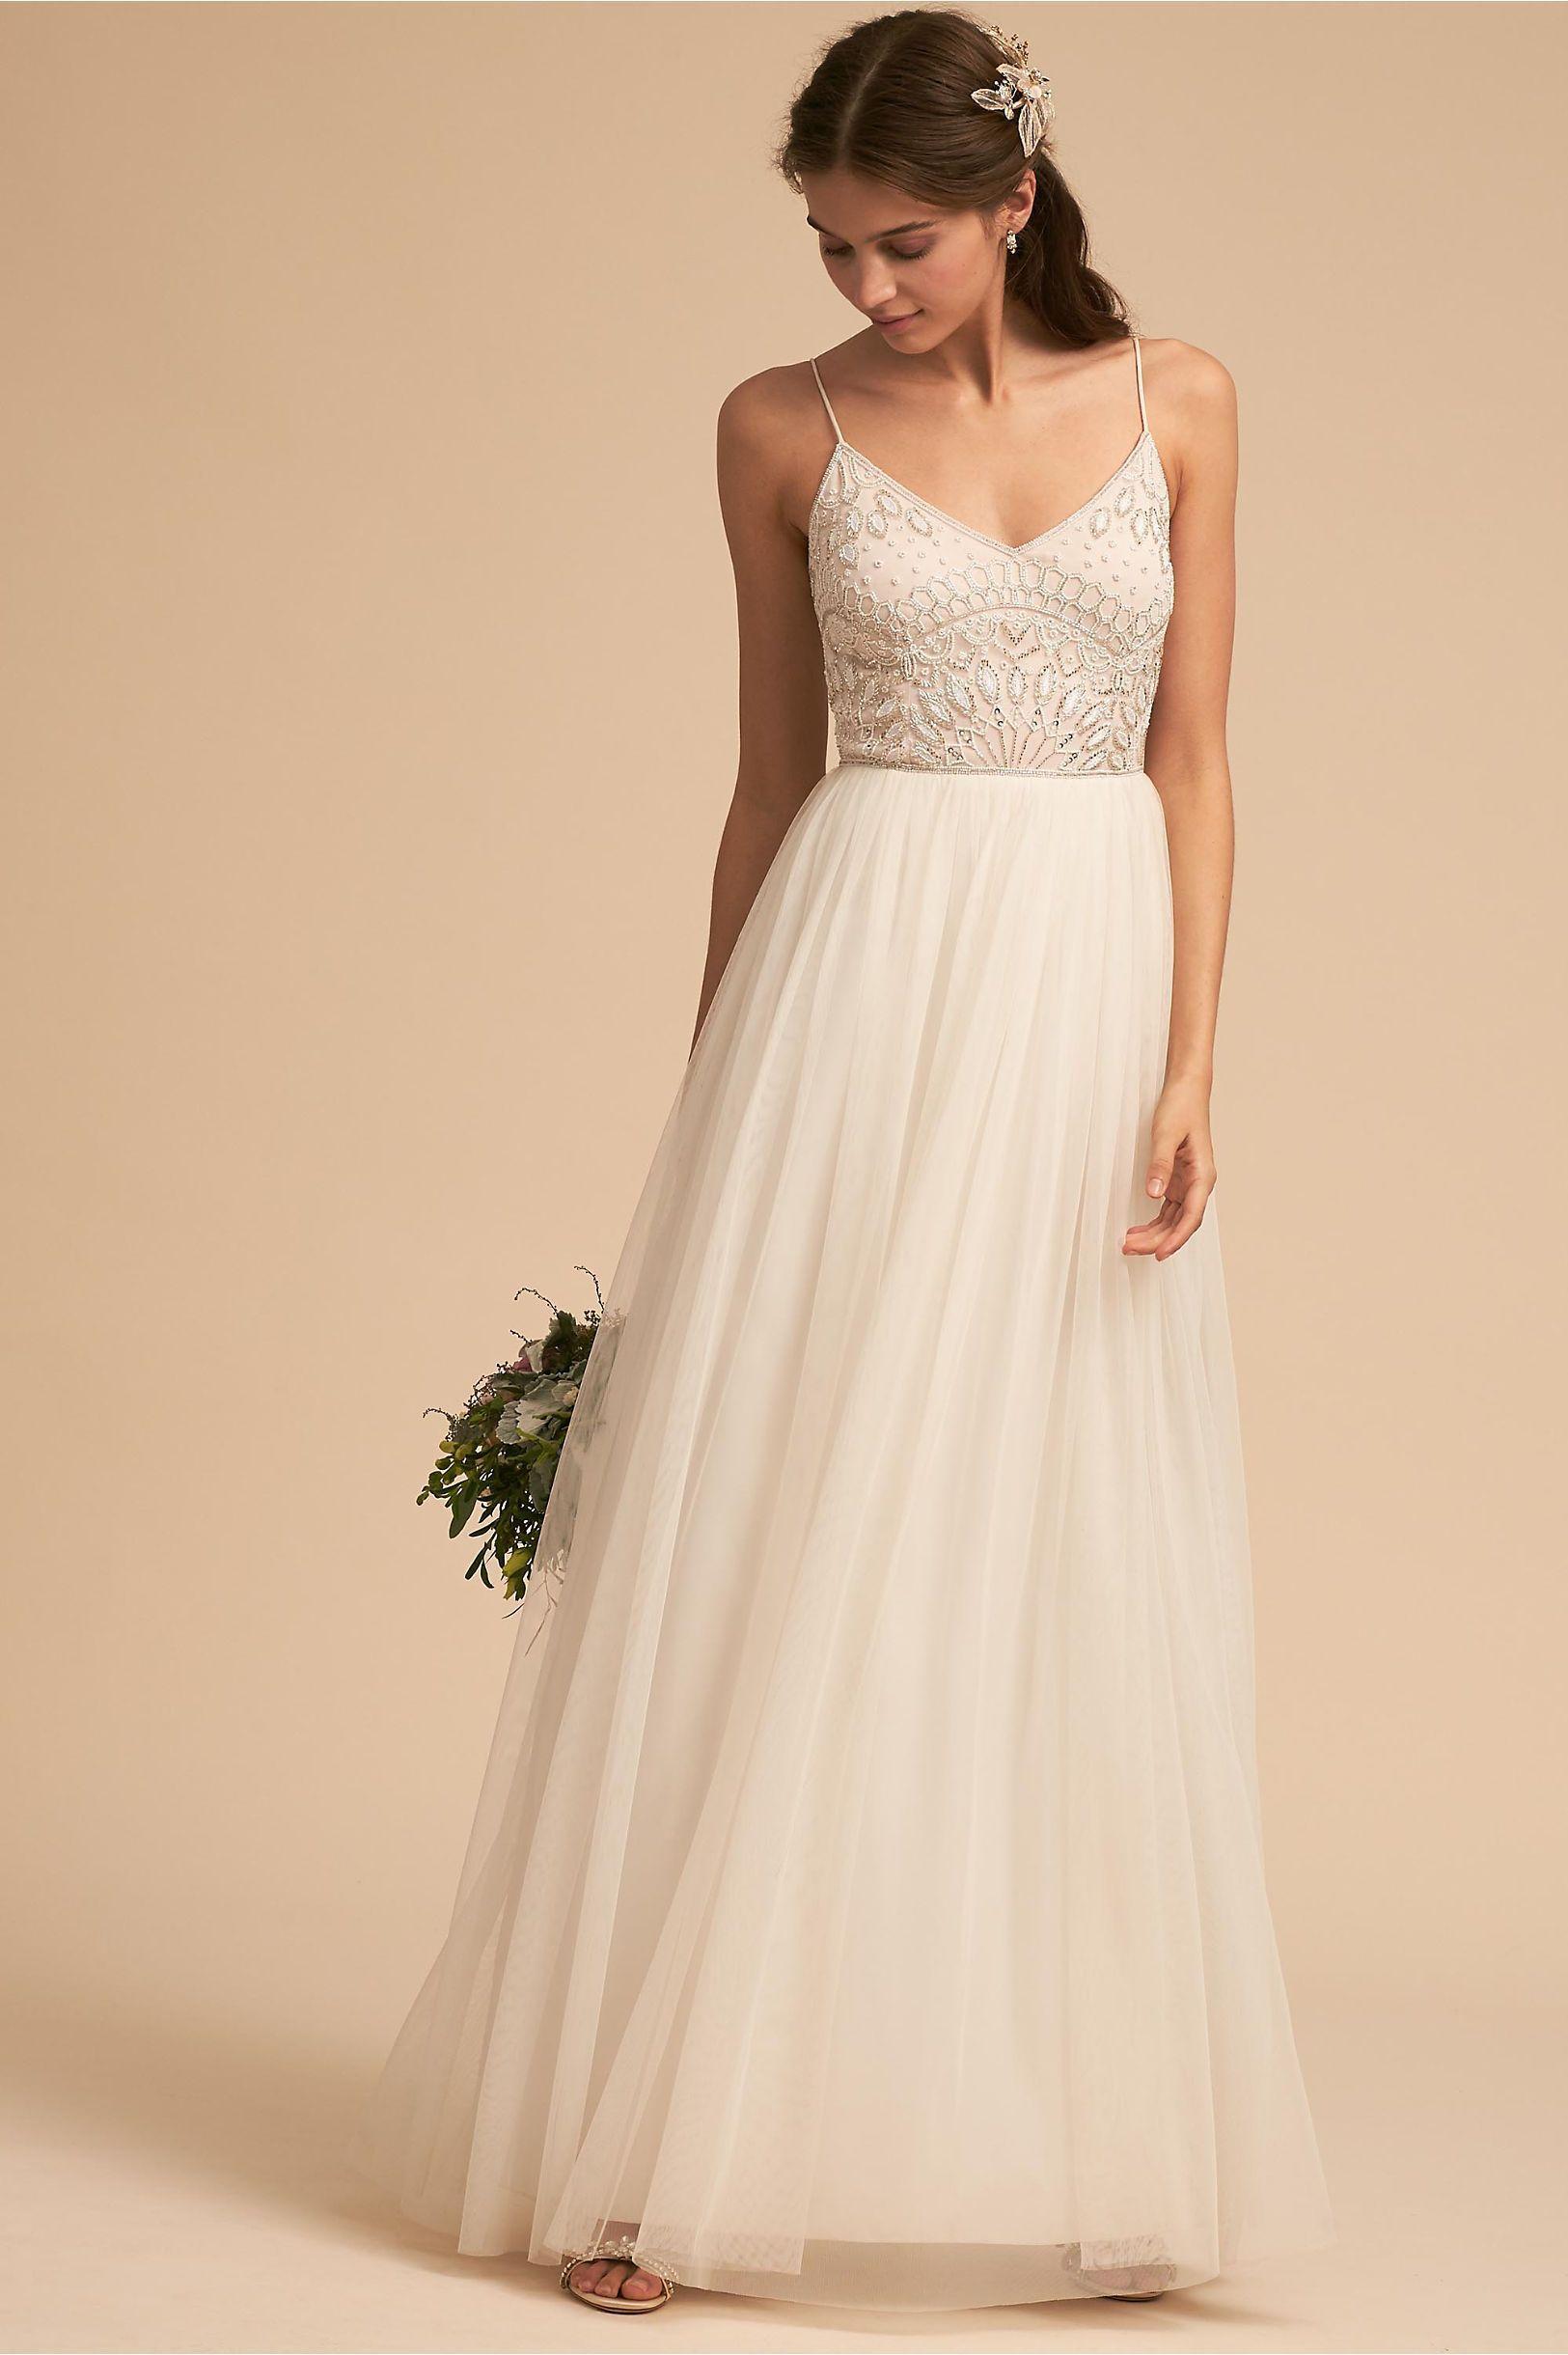 For Brides On A Budget Wedding Dresses Under 500 Perfete Wedding Dresses Under 500 Wedding Dresses Perfect Wedding Dress